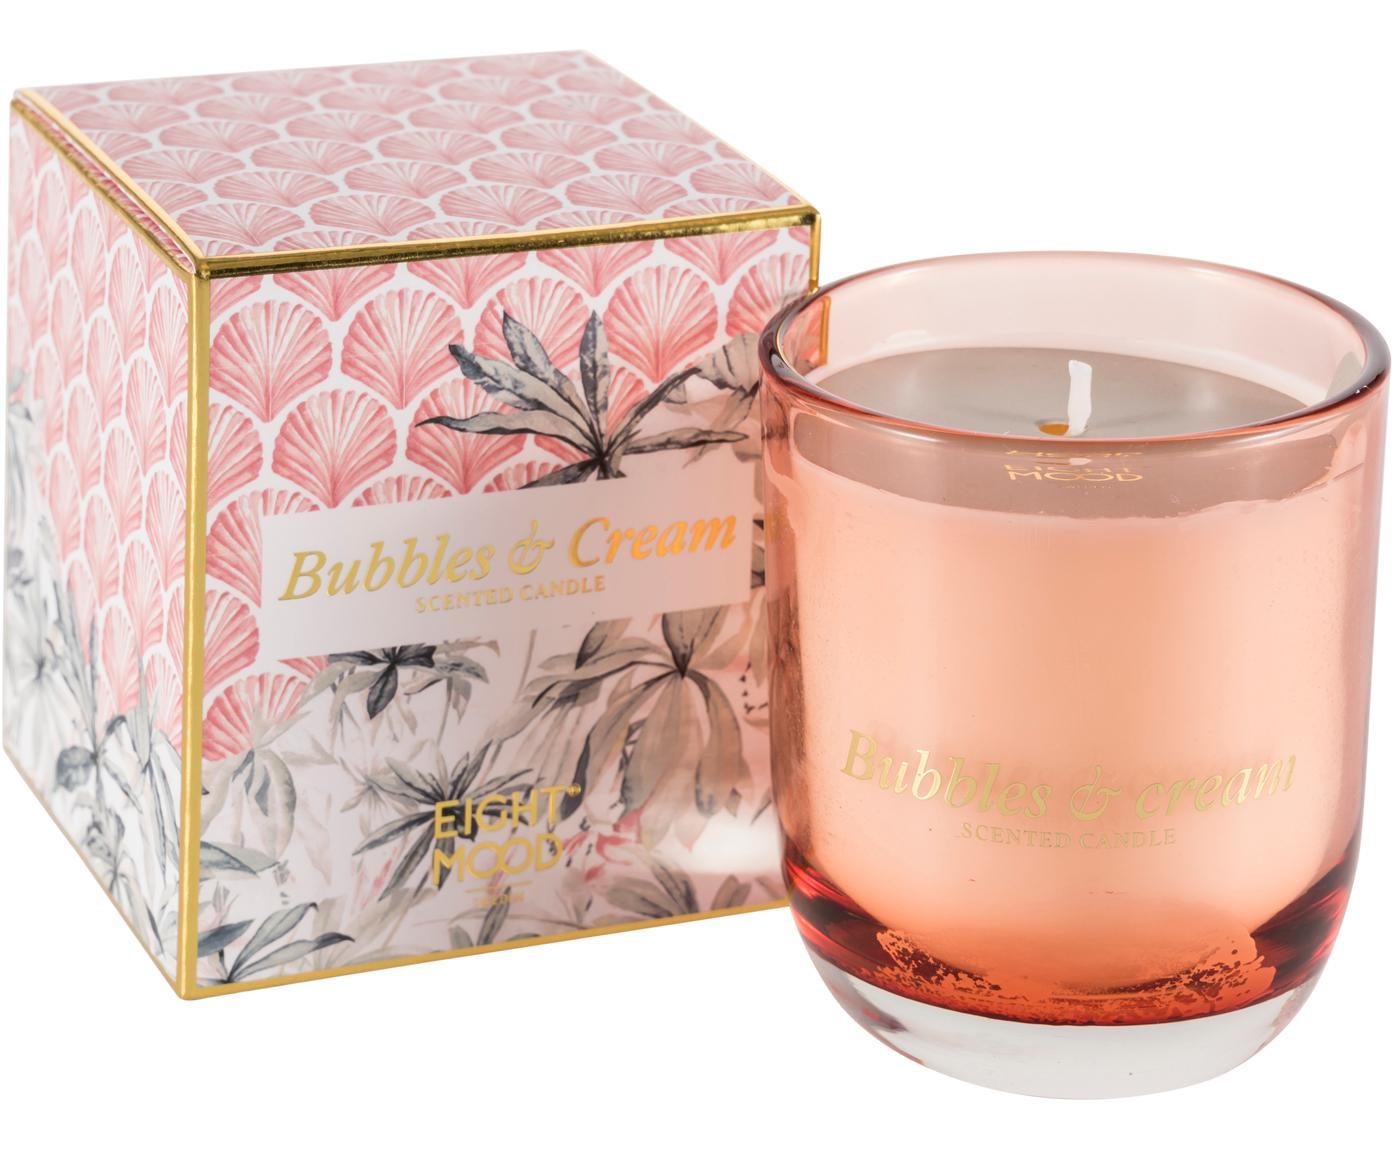 Duftkerze Allure (Tuberose, Jasmin, Zedernholz), Box: Papier, Behälter: Glas, Rosa, Mehrfarbig, 8 x 9 cm